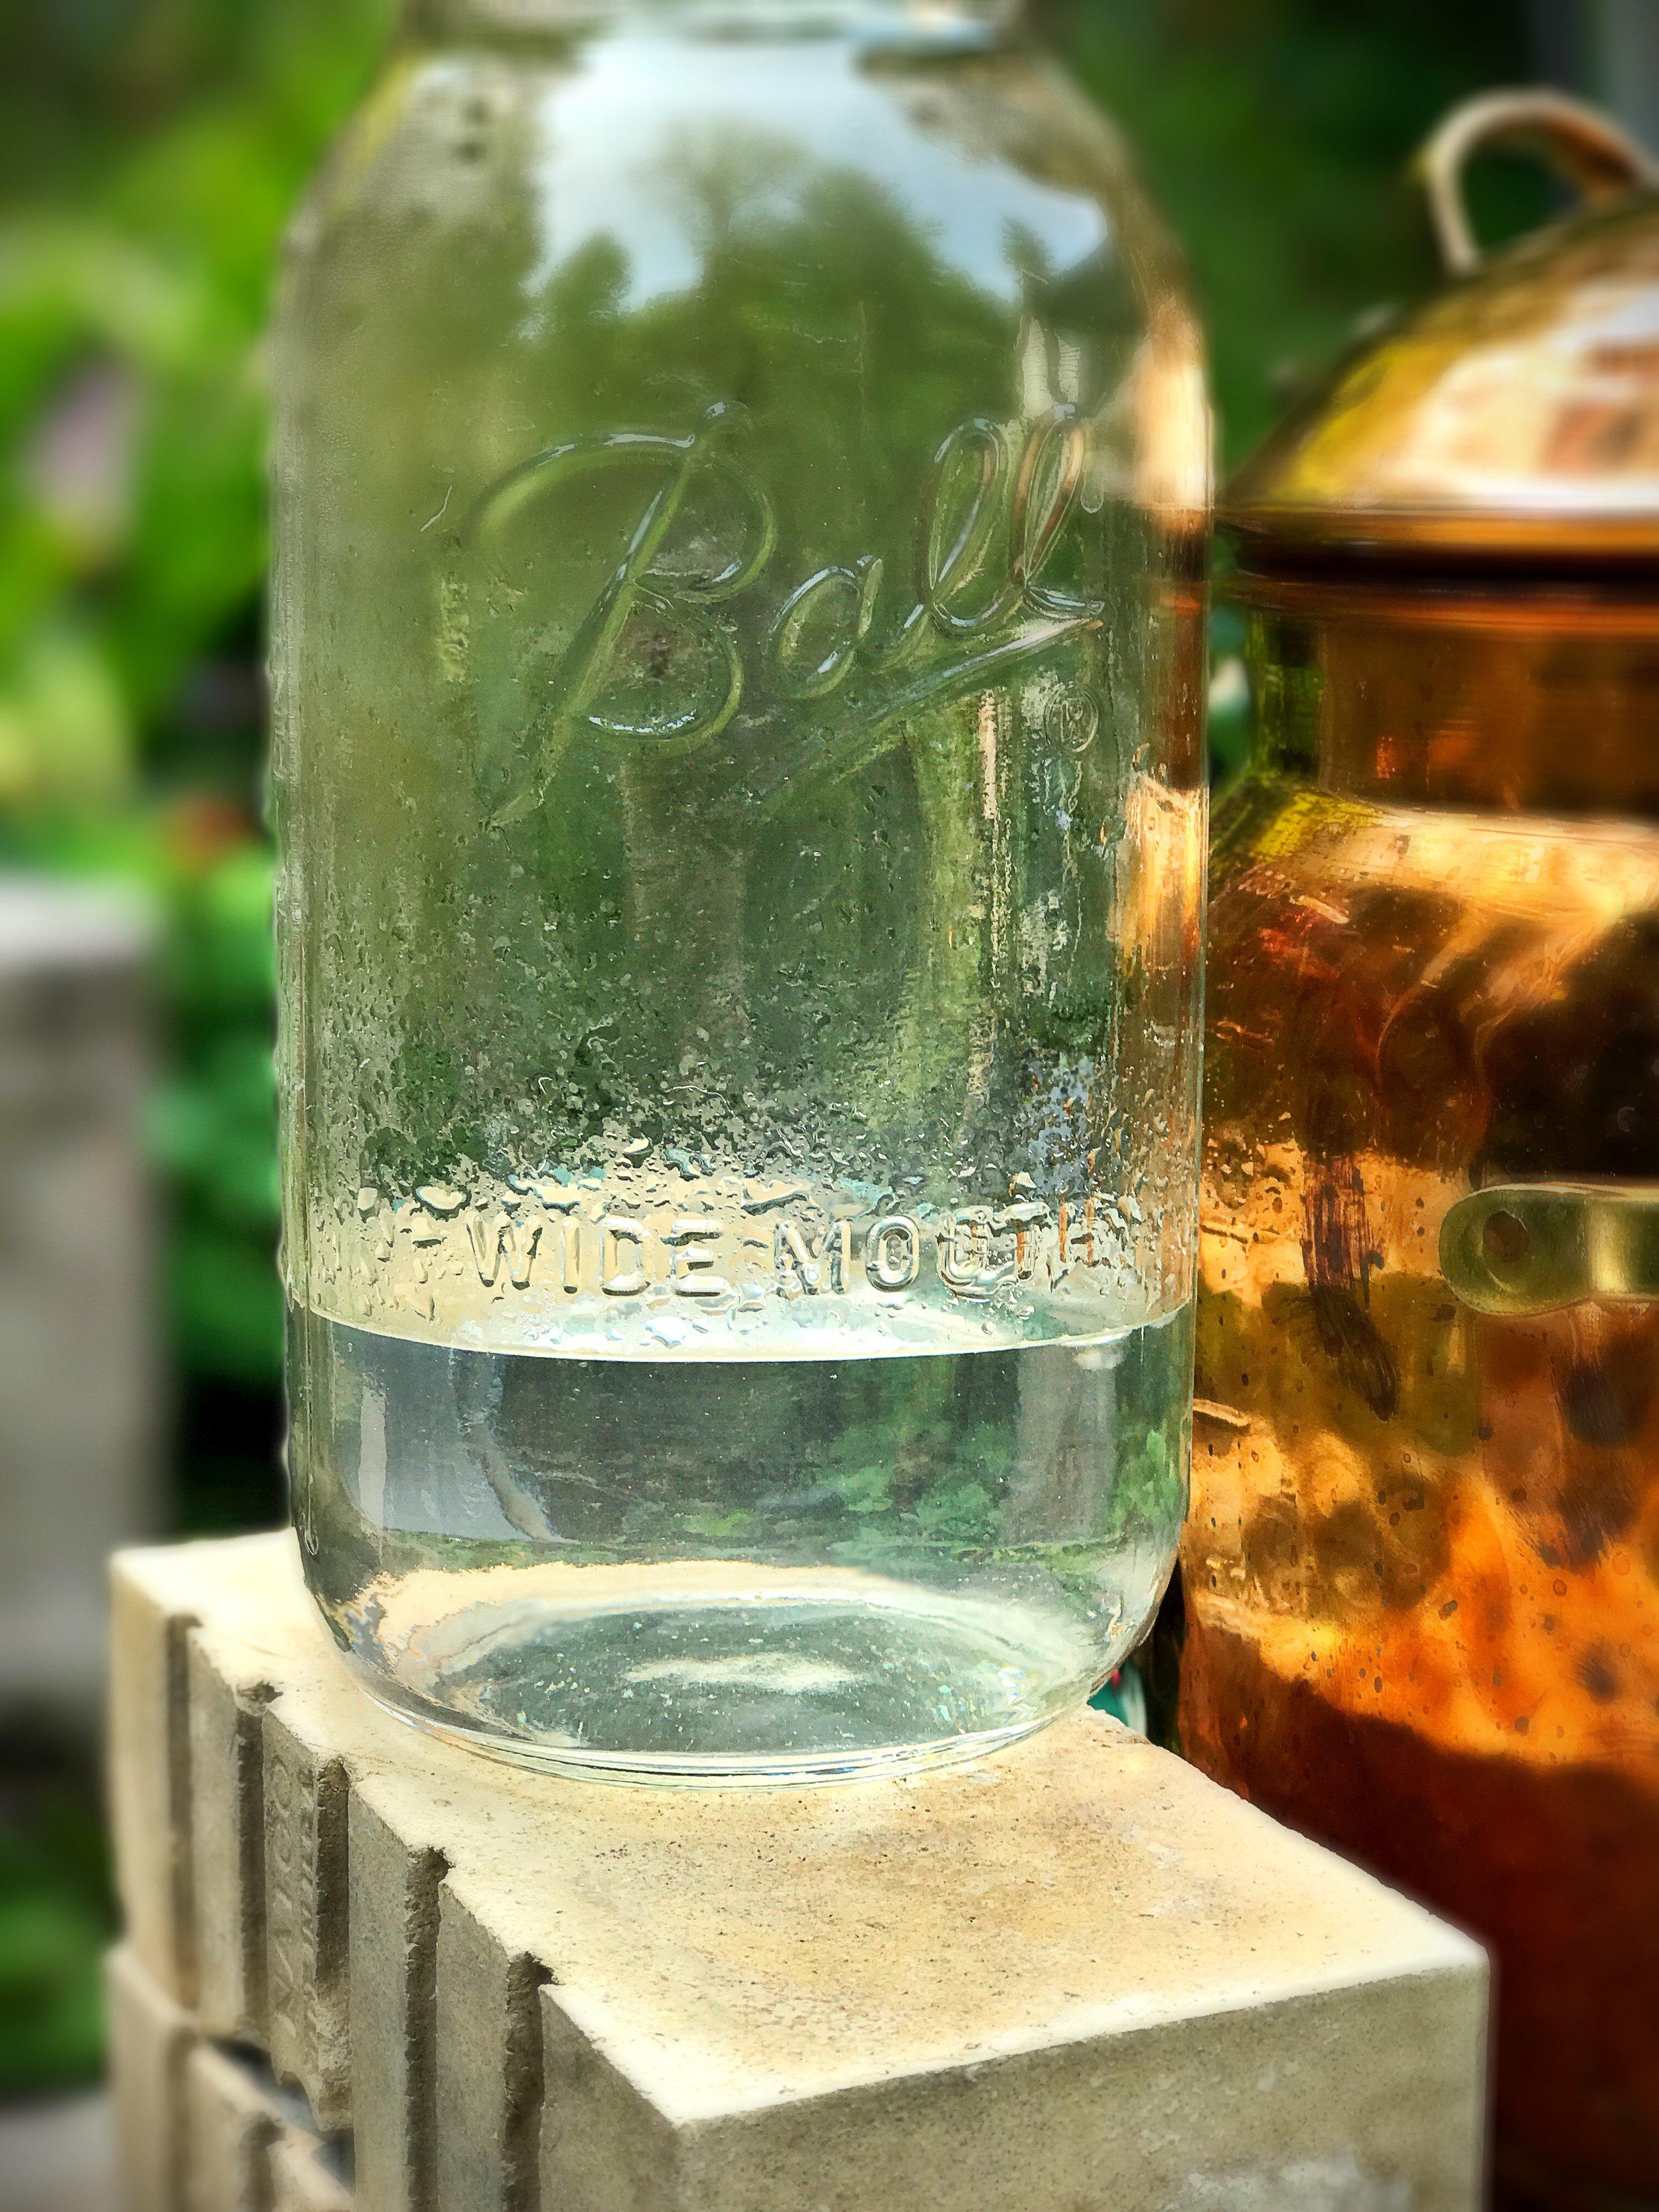 Halfway through the distillation. Lemon balm (Melissa officinalis) hydrosol is illuminating my vitality.